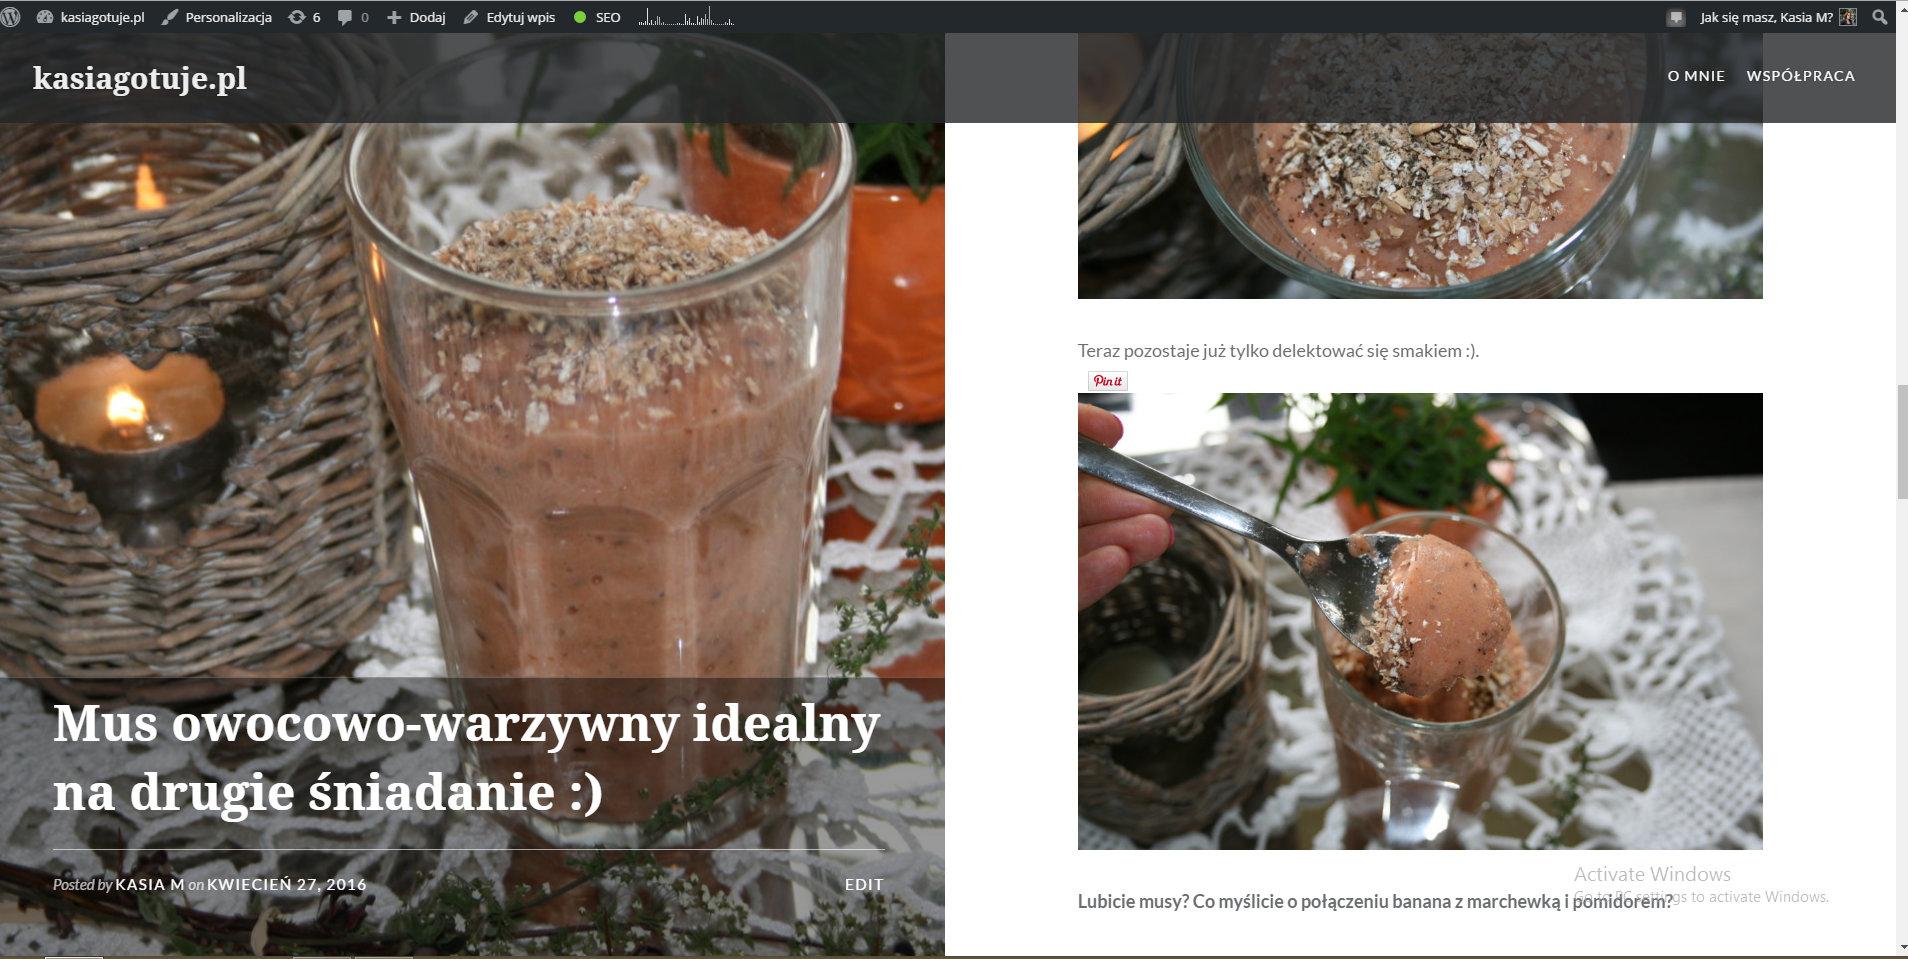 linkowe party i nowy blog